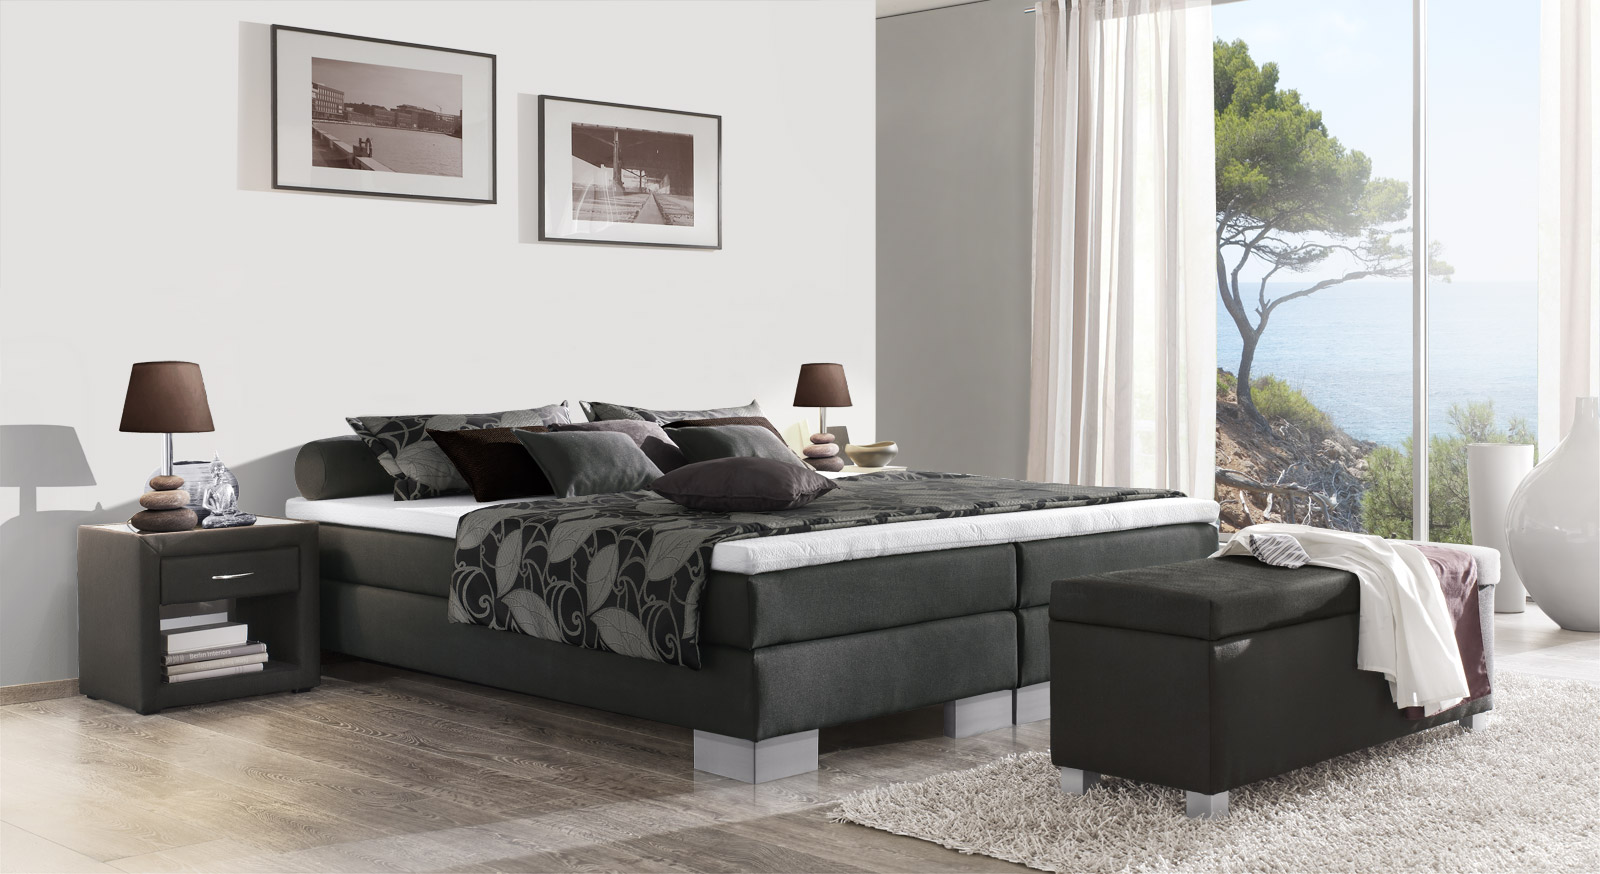 die partnerhotels probeschlafen. Black Bedroom Furniture Sets. Home Design Ideas